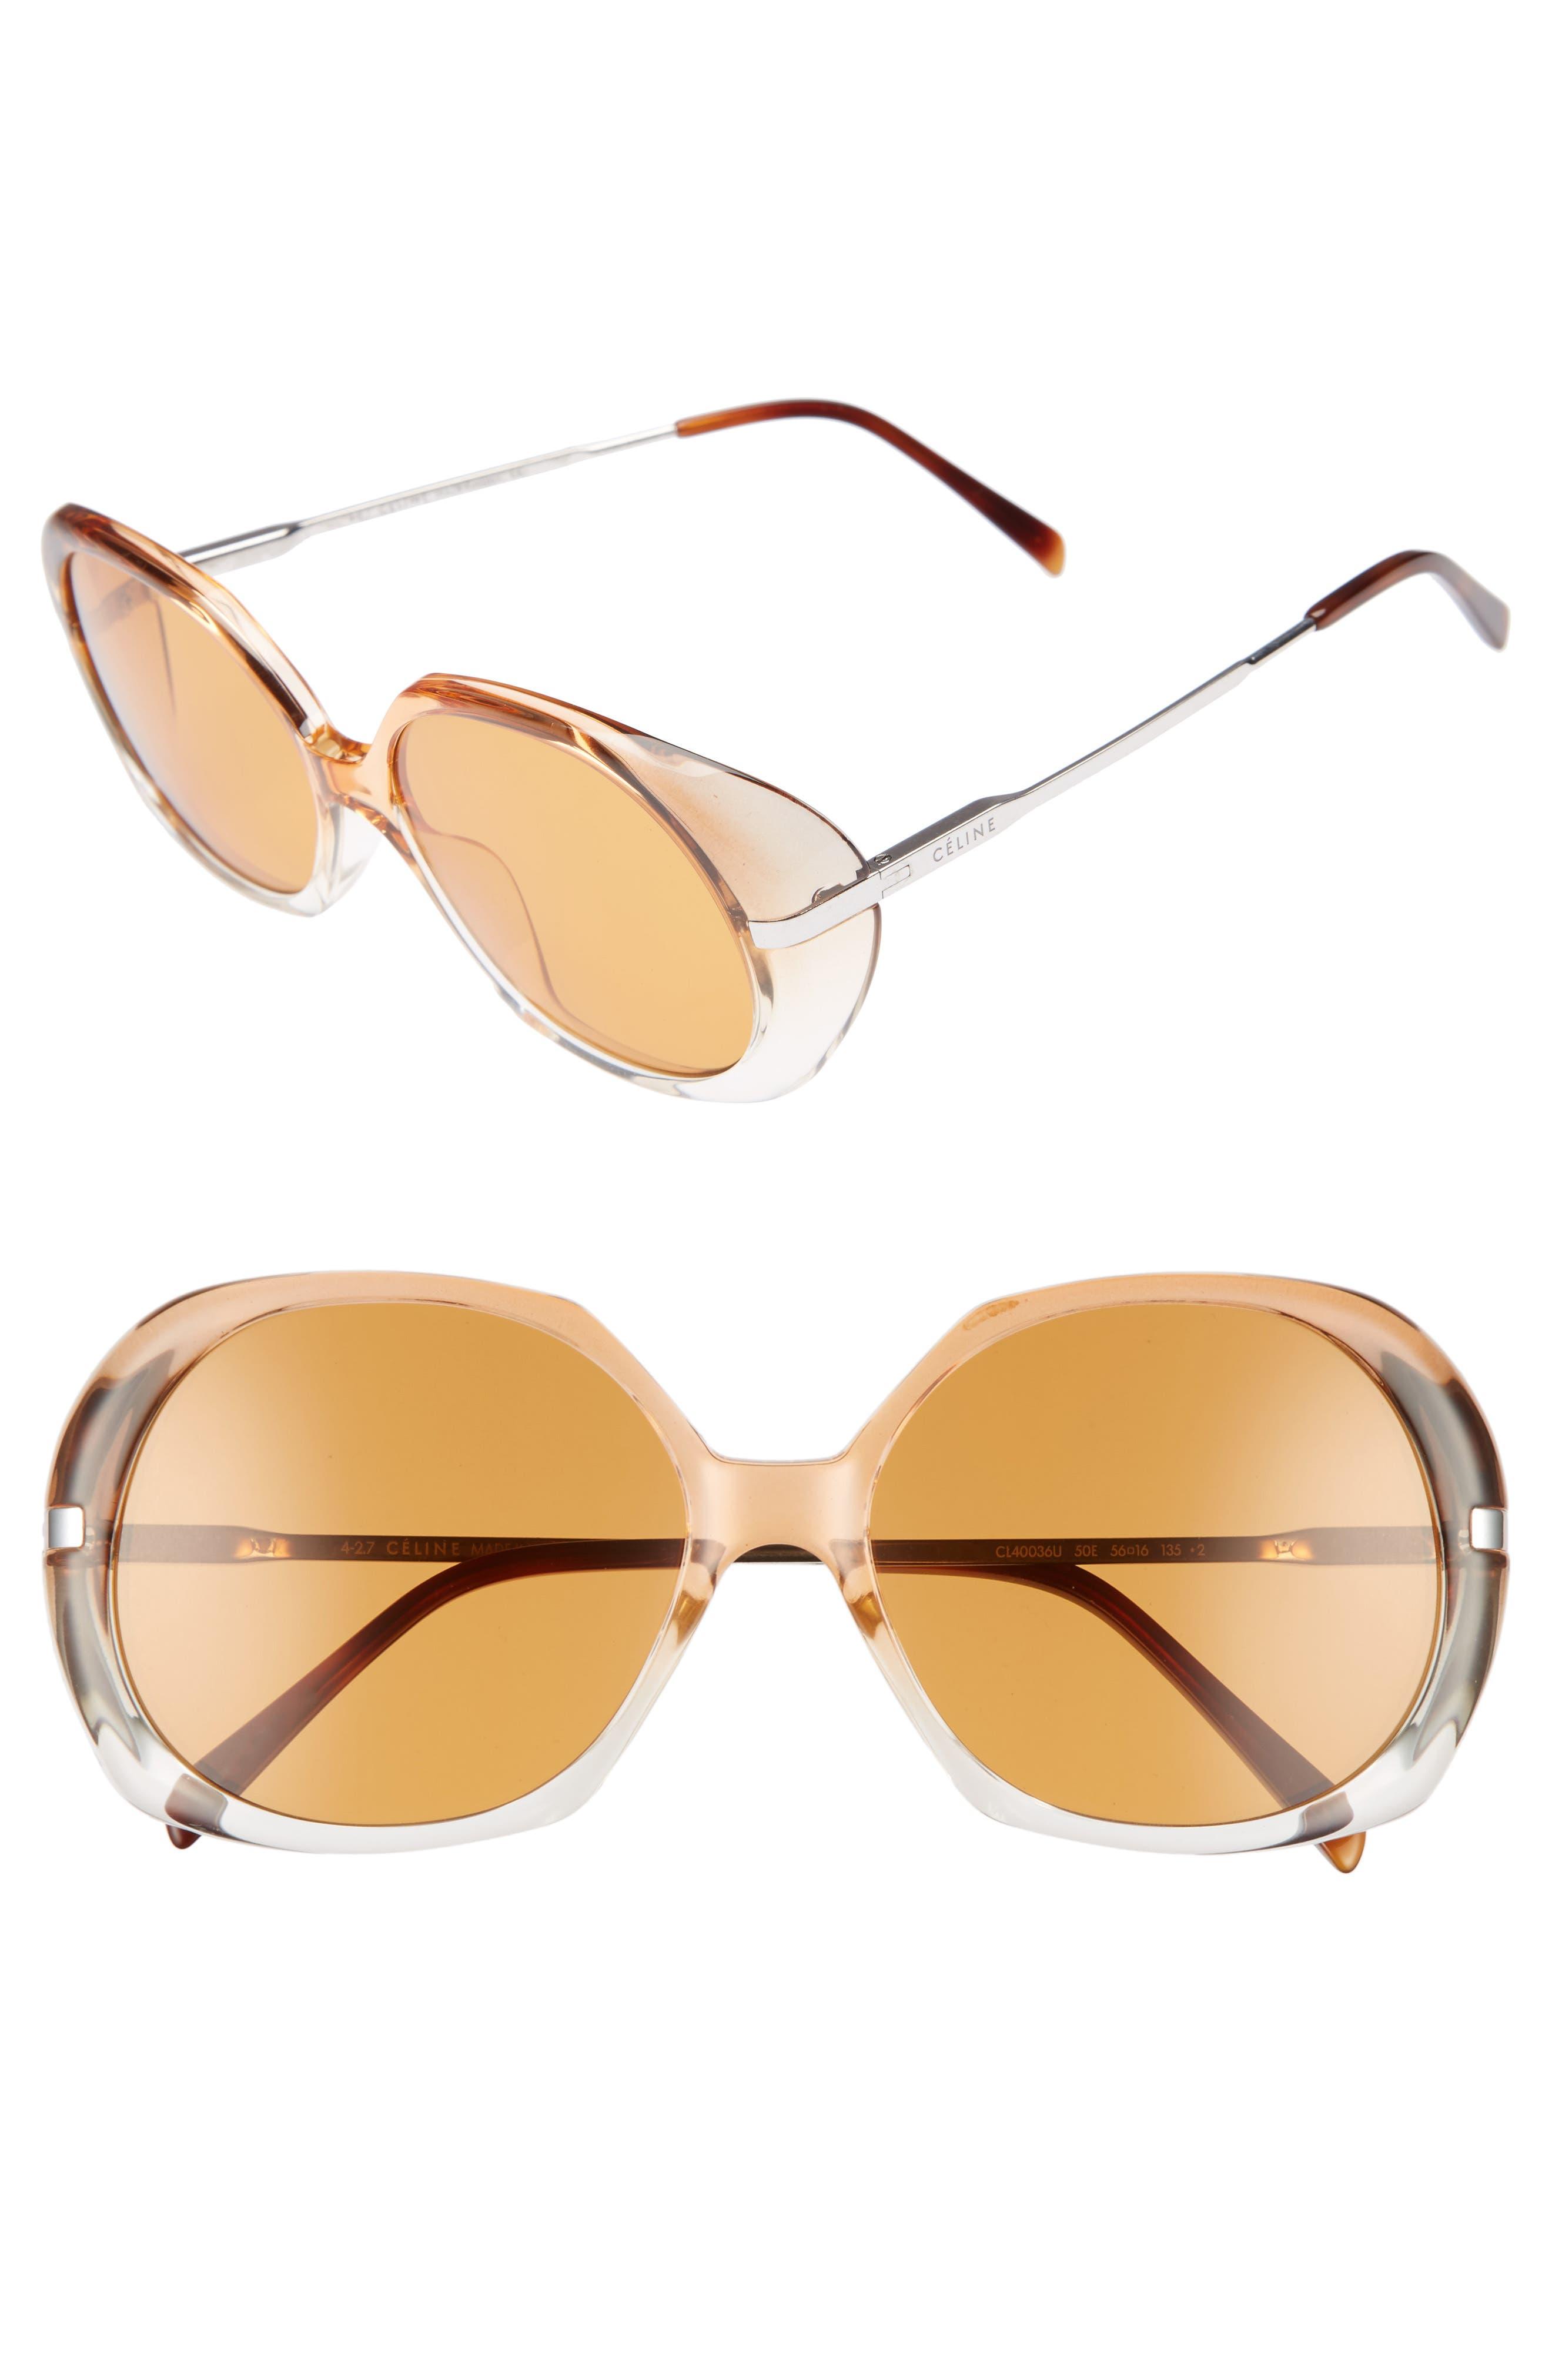 56mm Round Sunglasses,                             Main thumbnail 1, color,                             200